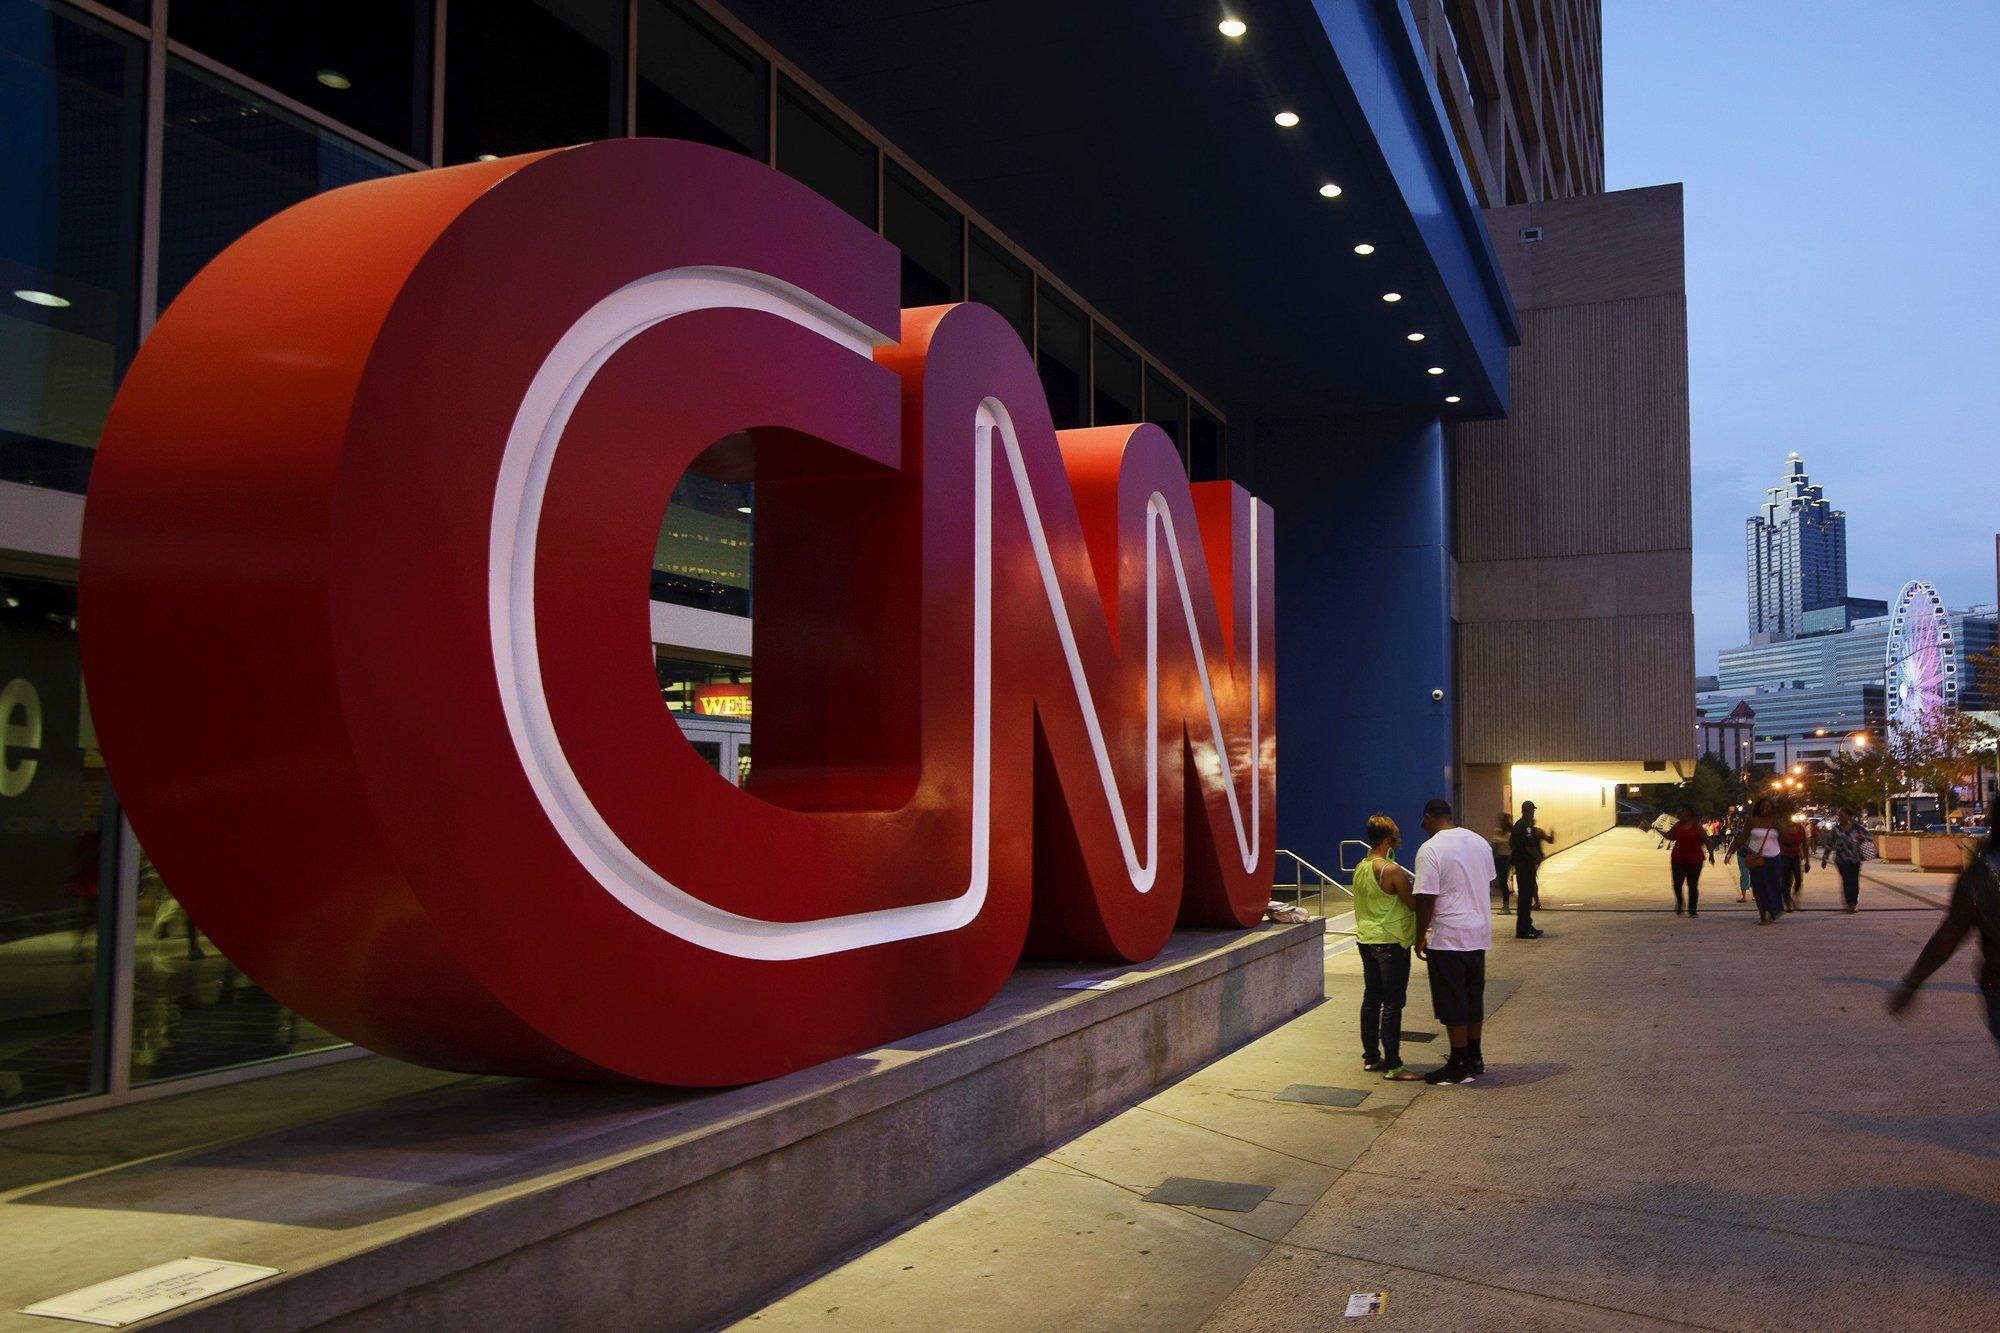 WATCH Conservative Student Defends Second Amendment in CNN Interview